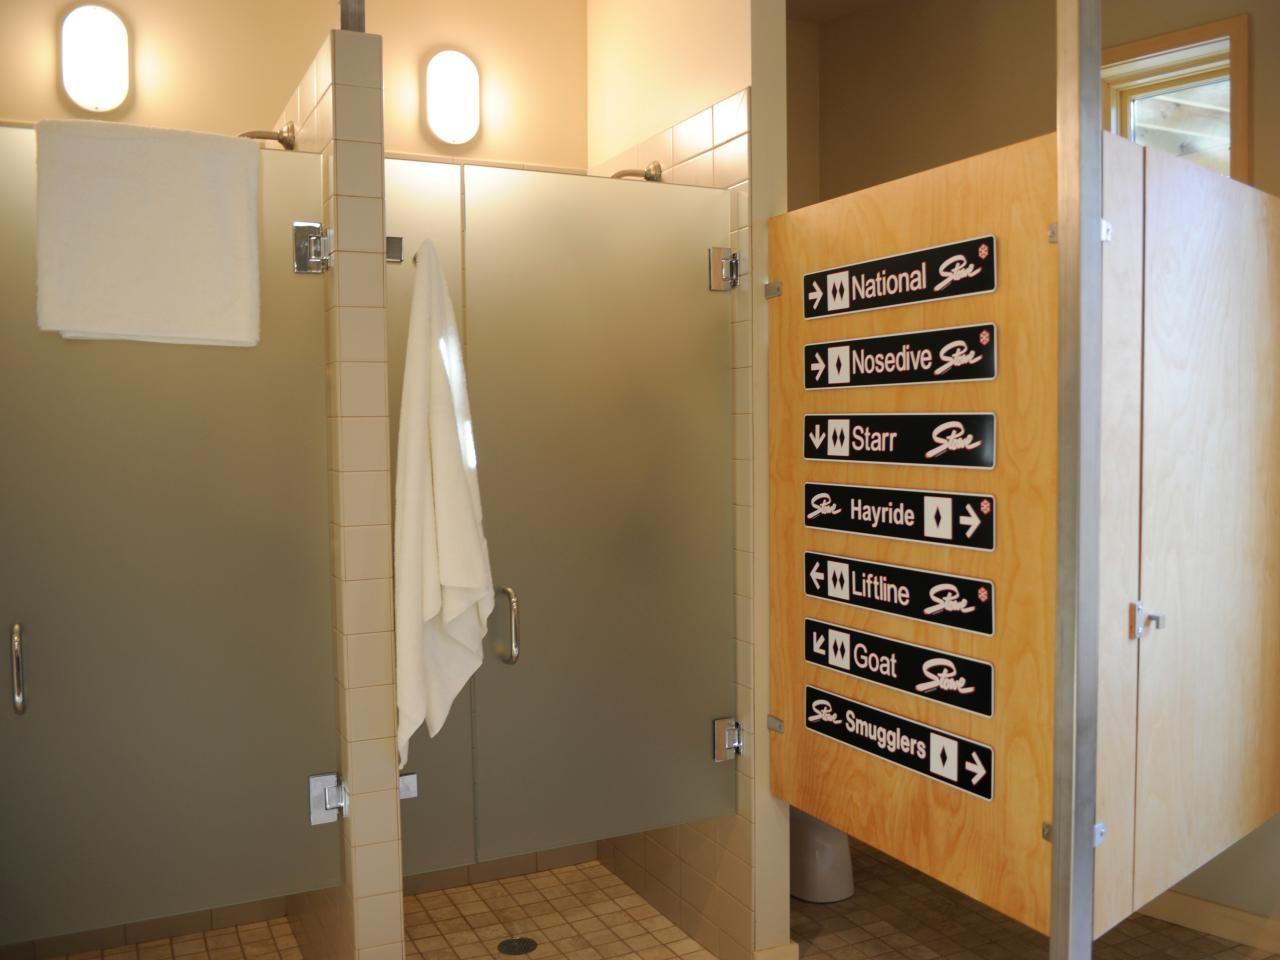 Bathroom Signs Video dorm bathroom from hgtv dream home 2011 | rumah, asrama mahasiswa